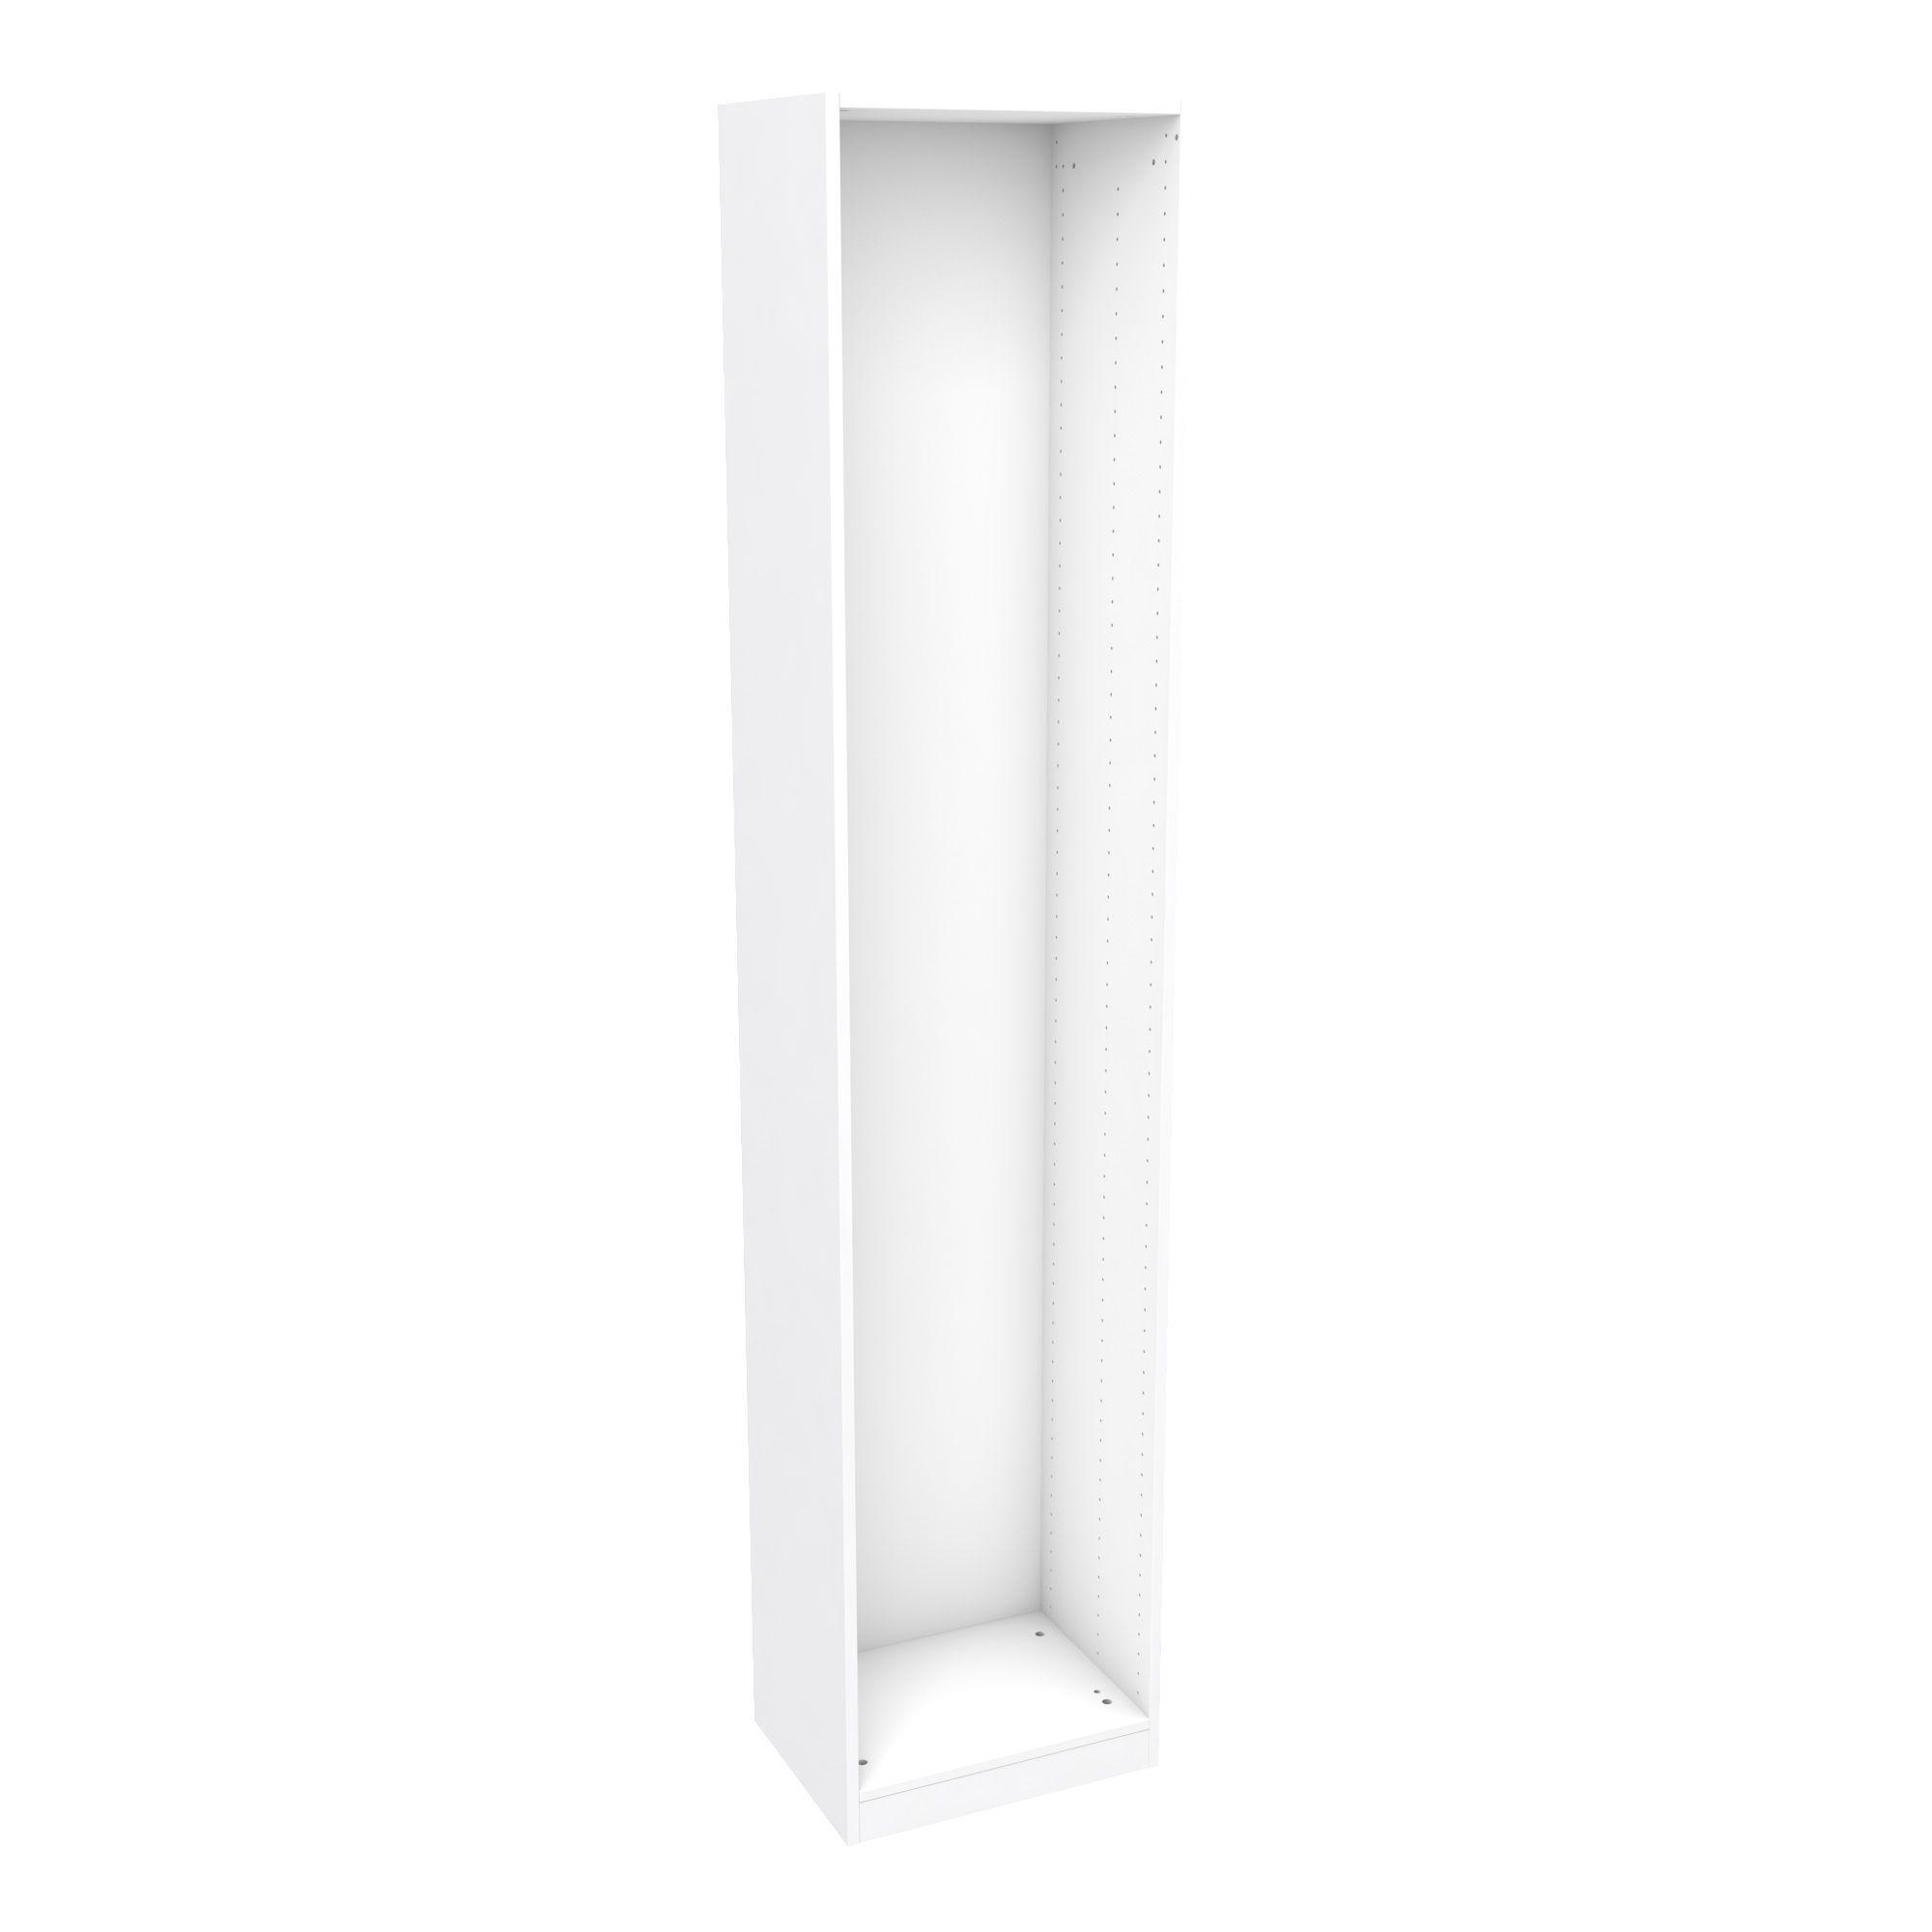 Darwin Modular White Tall Wardrobe Cabinet (h)2356mm (w)500mm (d)374mm